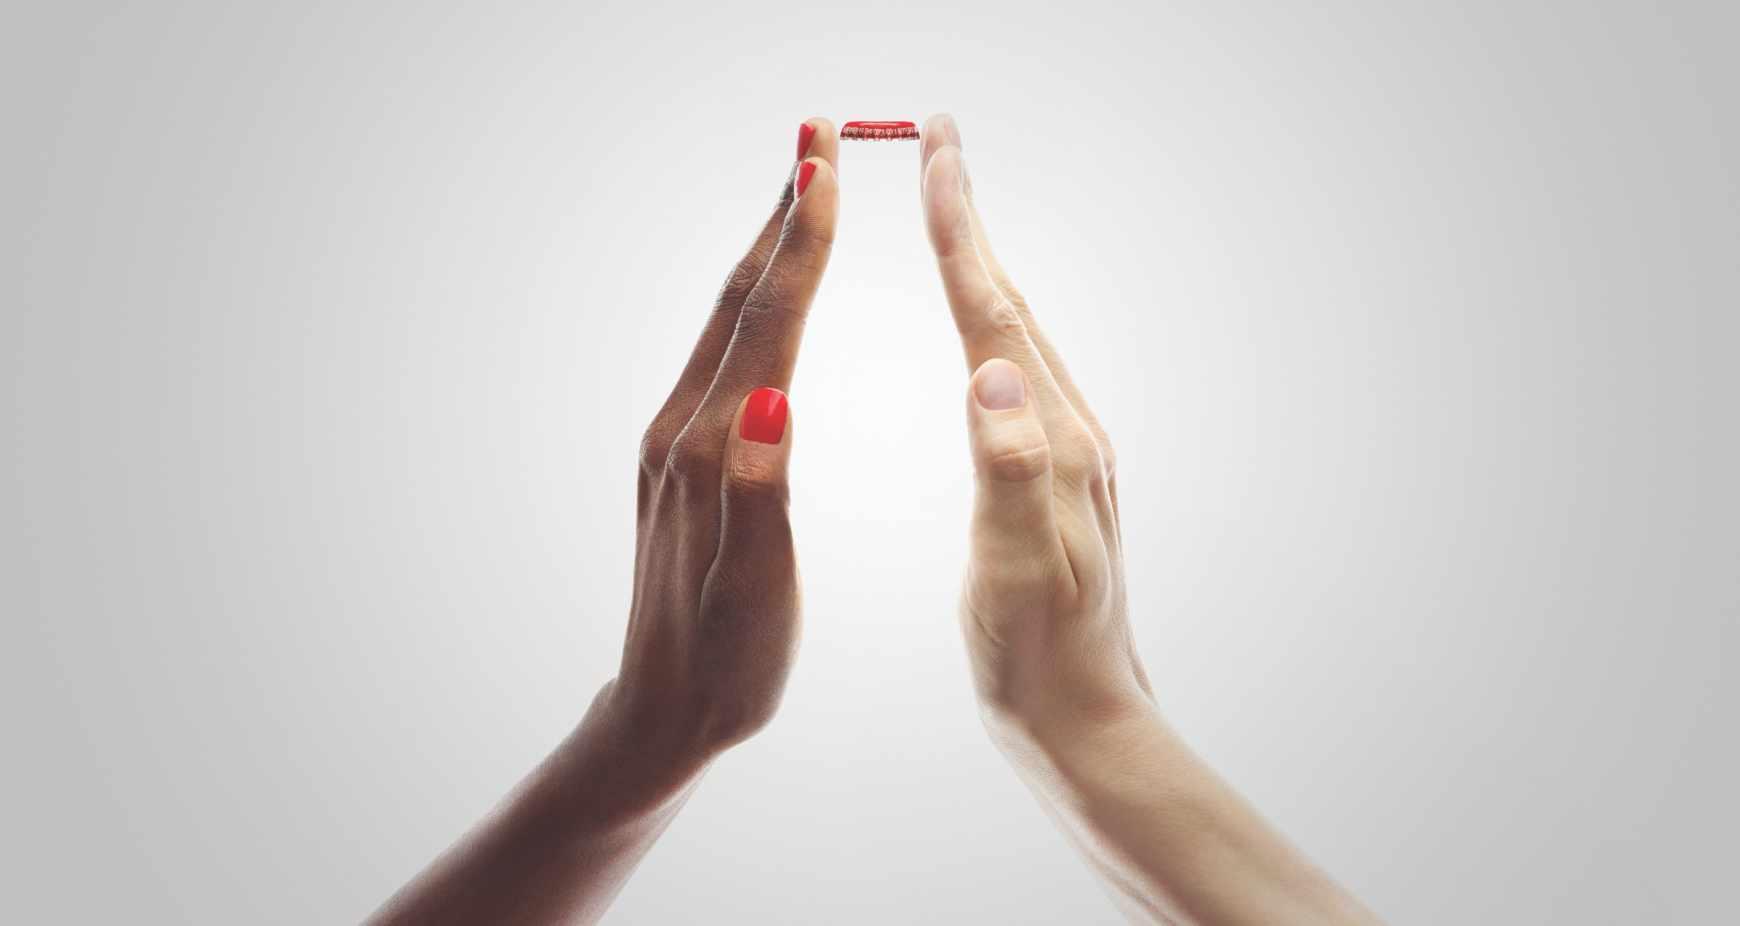 coke_contour_together_europe_print_love_2015_om_aotw